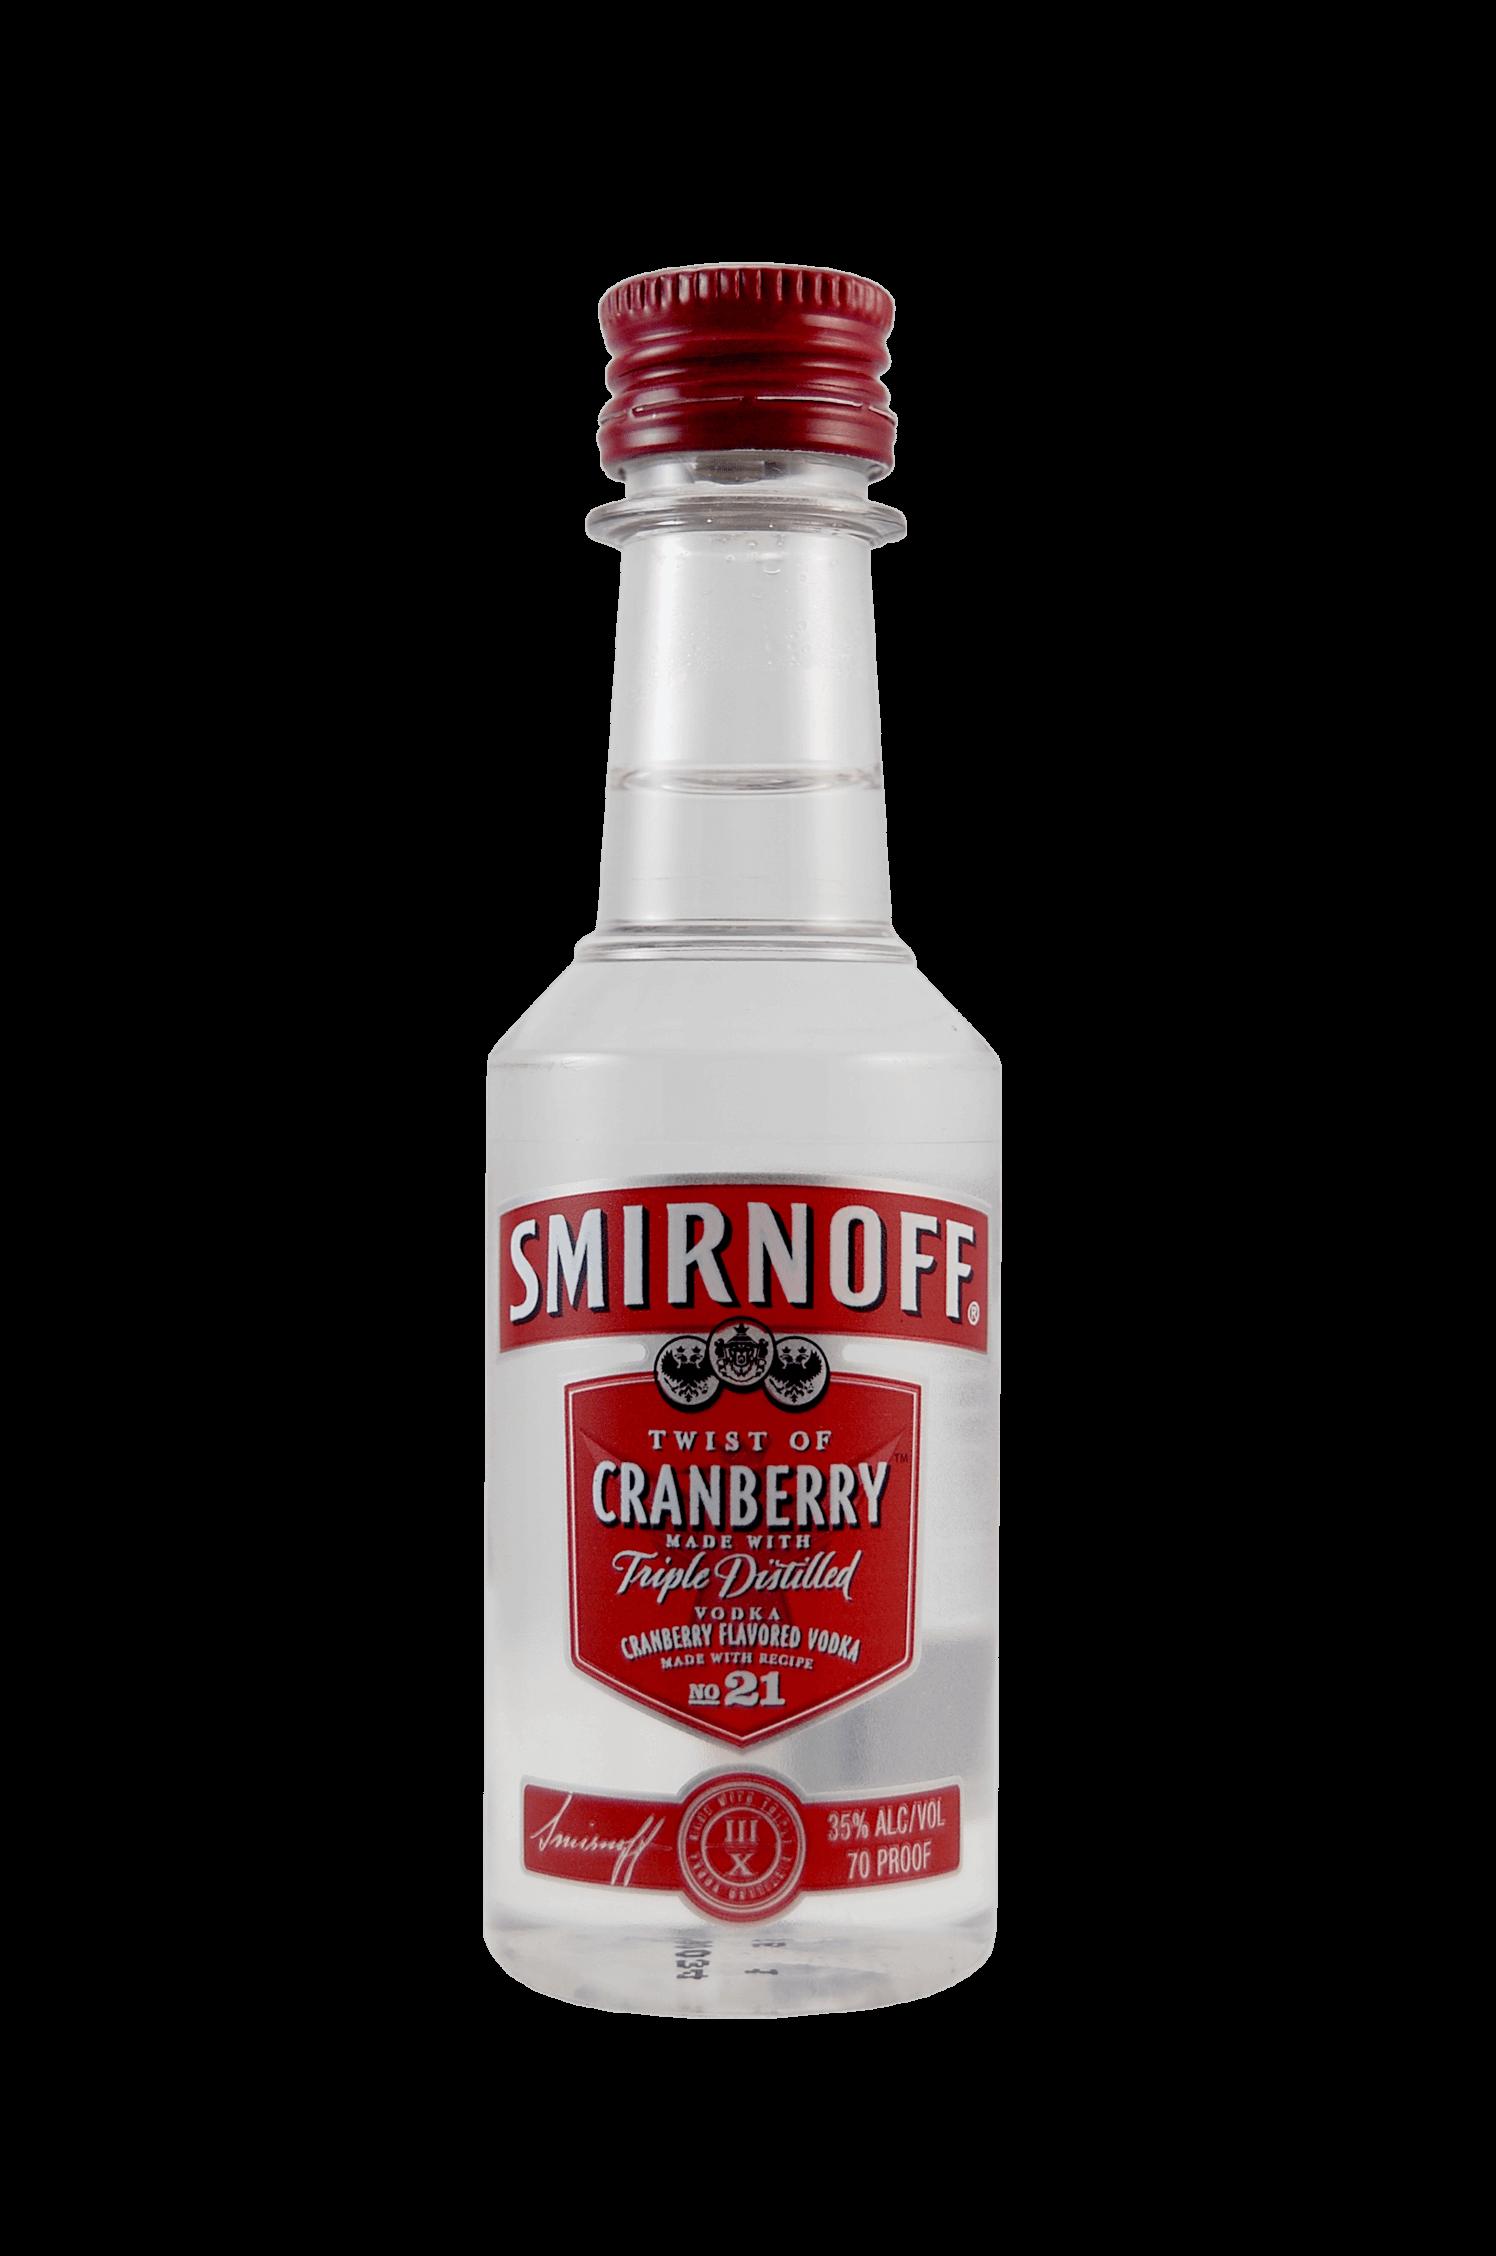 Smirnoff Cranberry